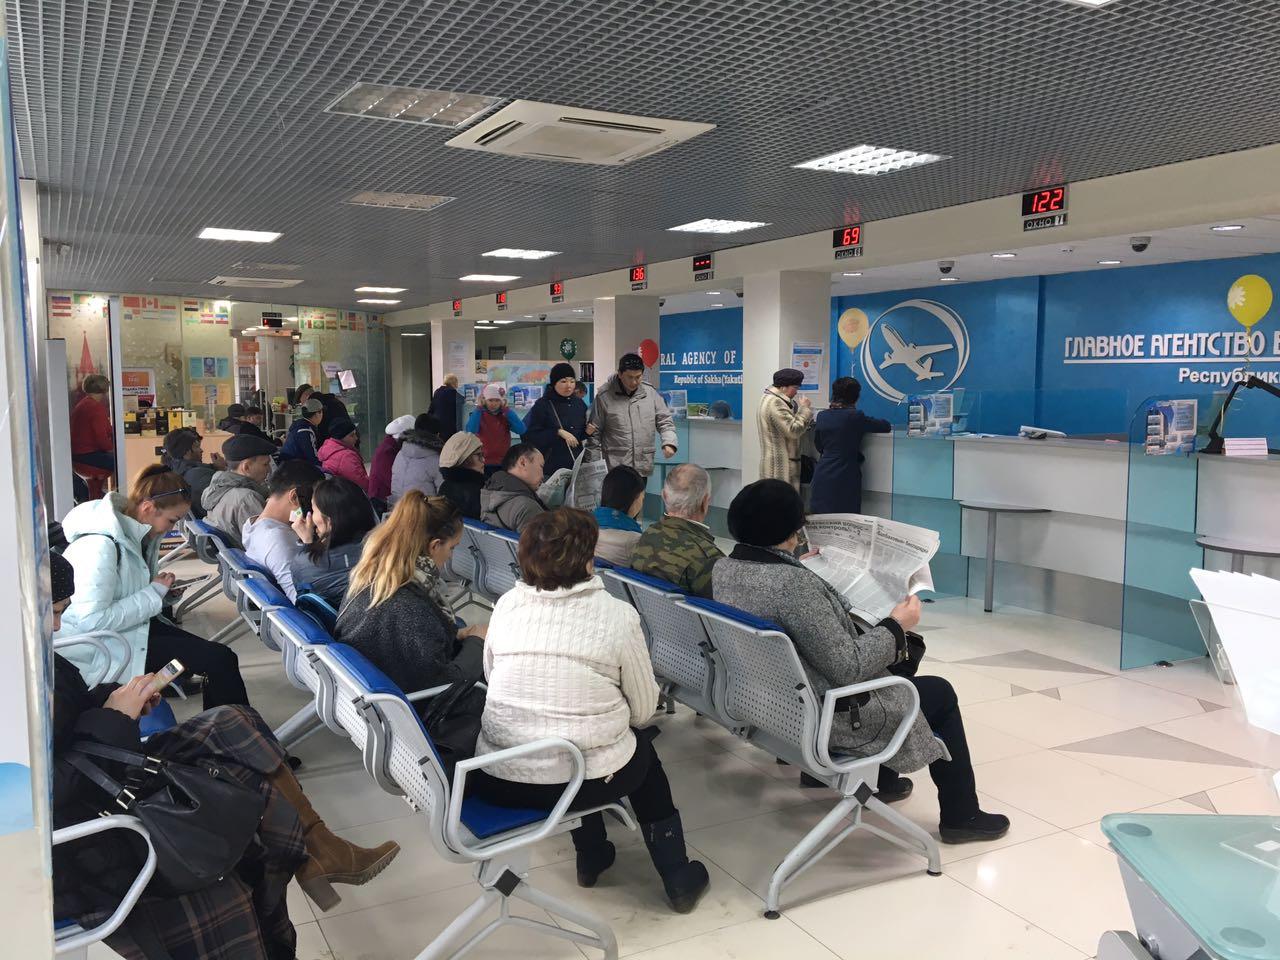 Авиабилеты студентам саратов